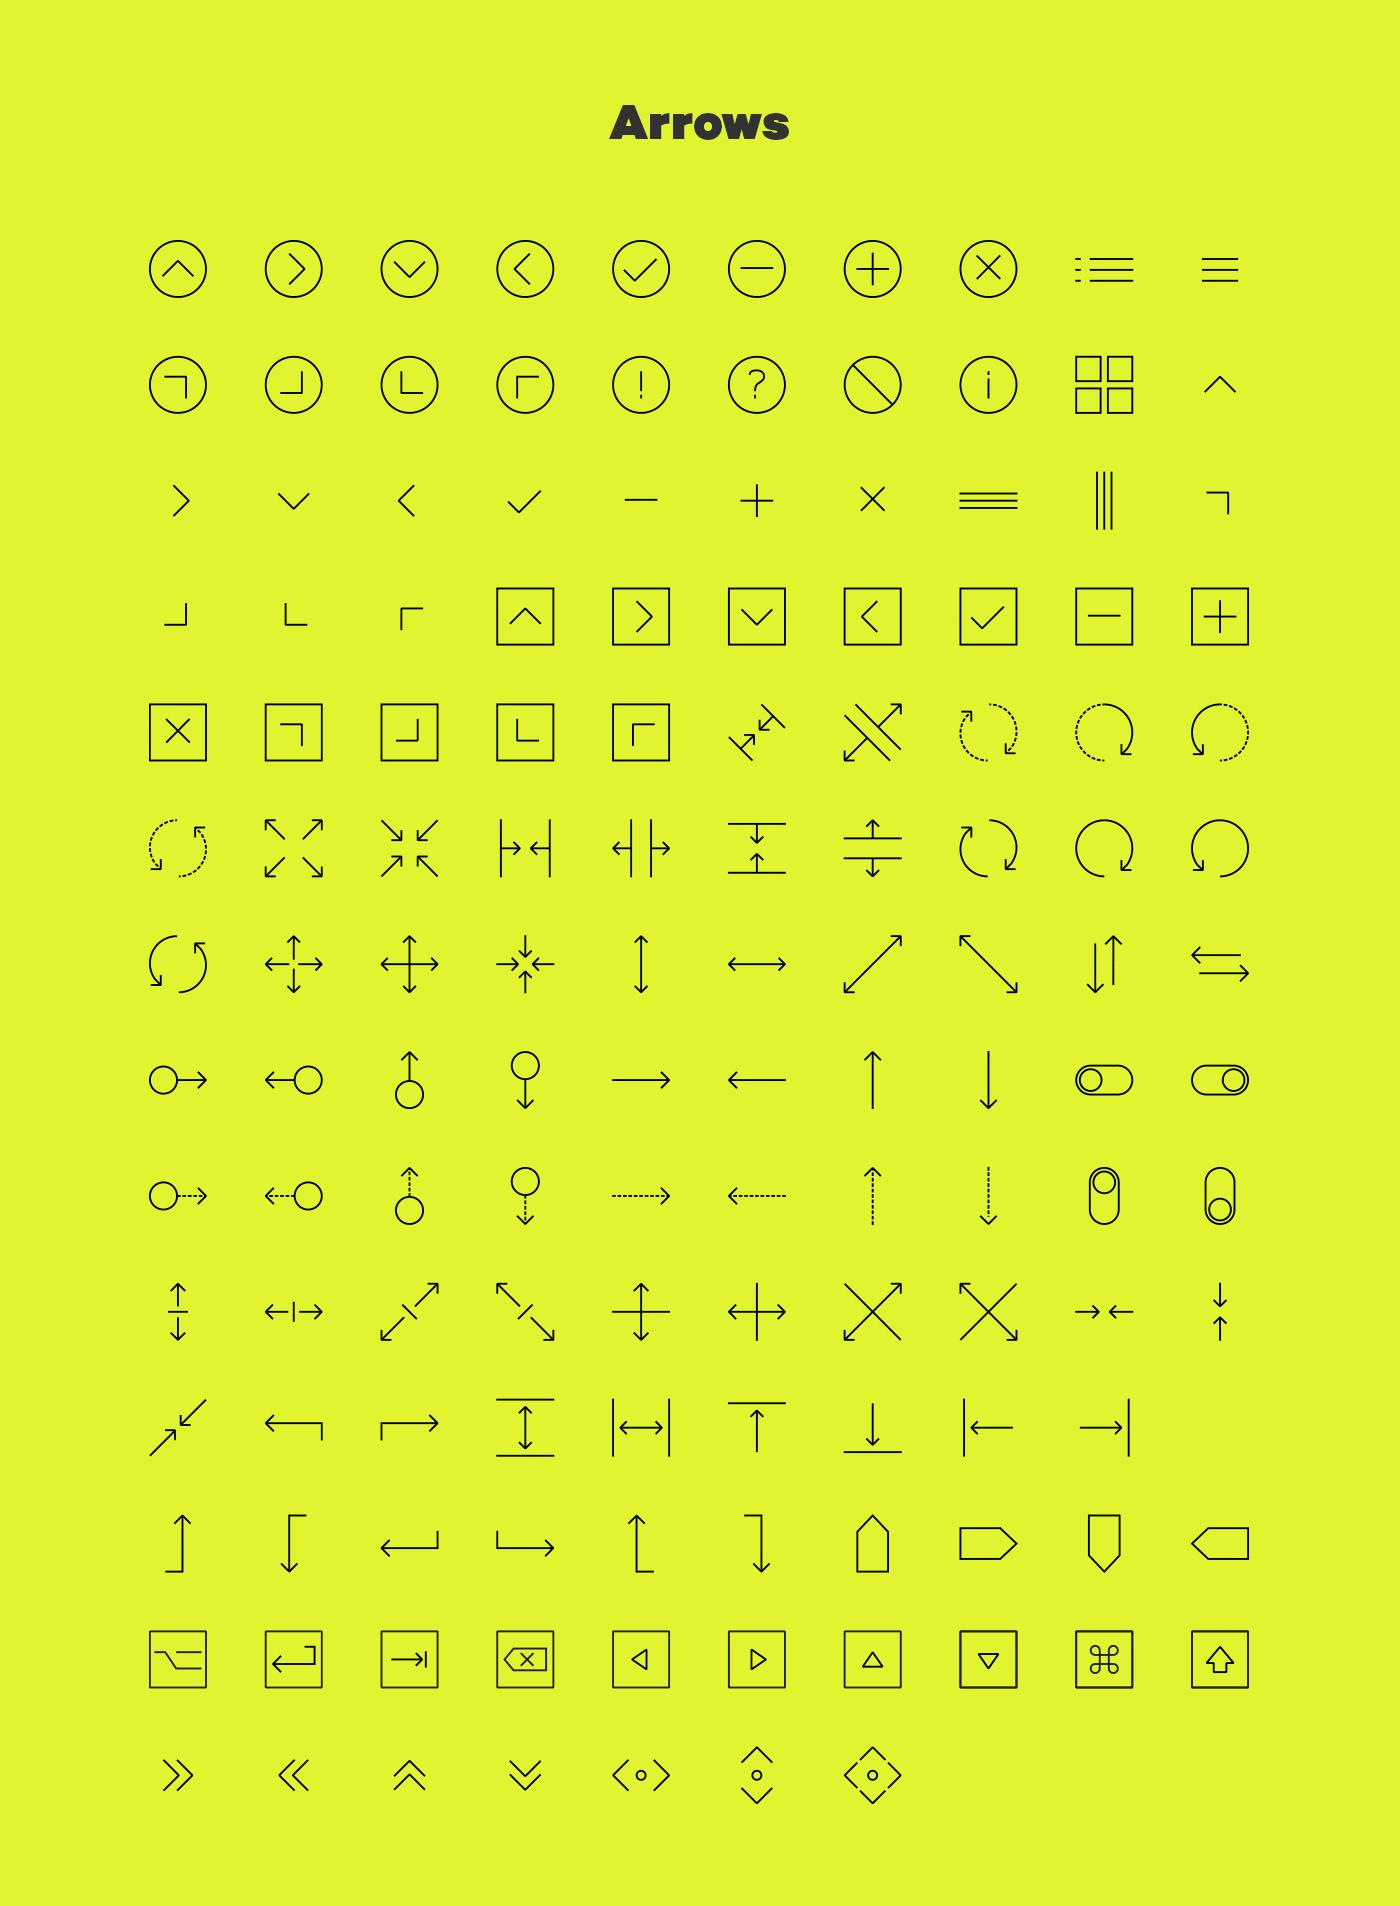 Linea Free Iconset on Behance